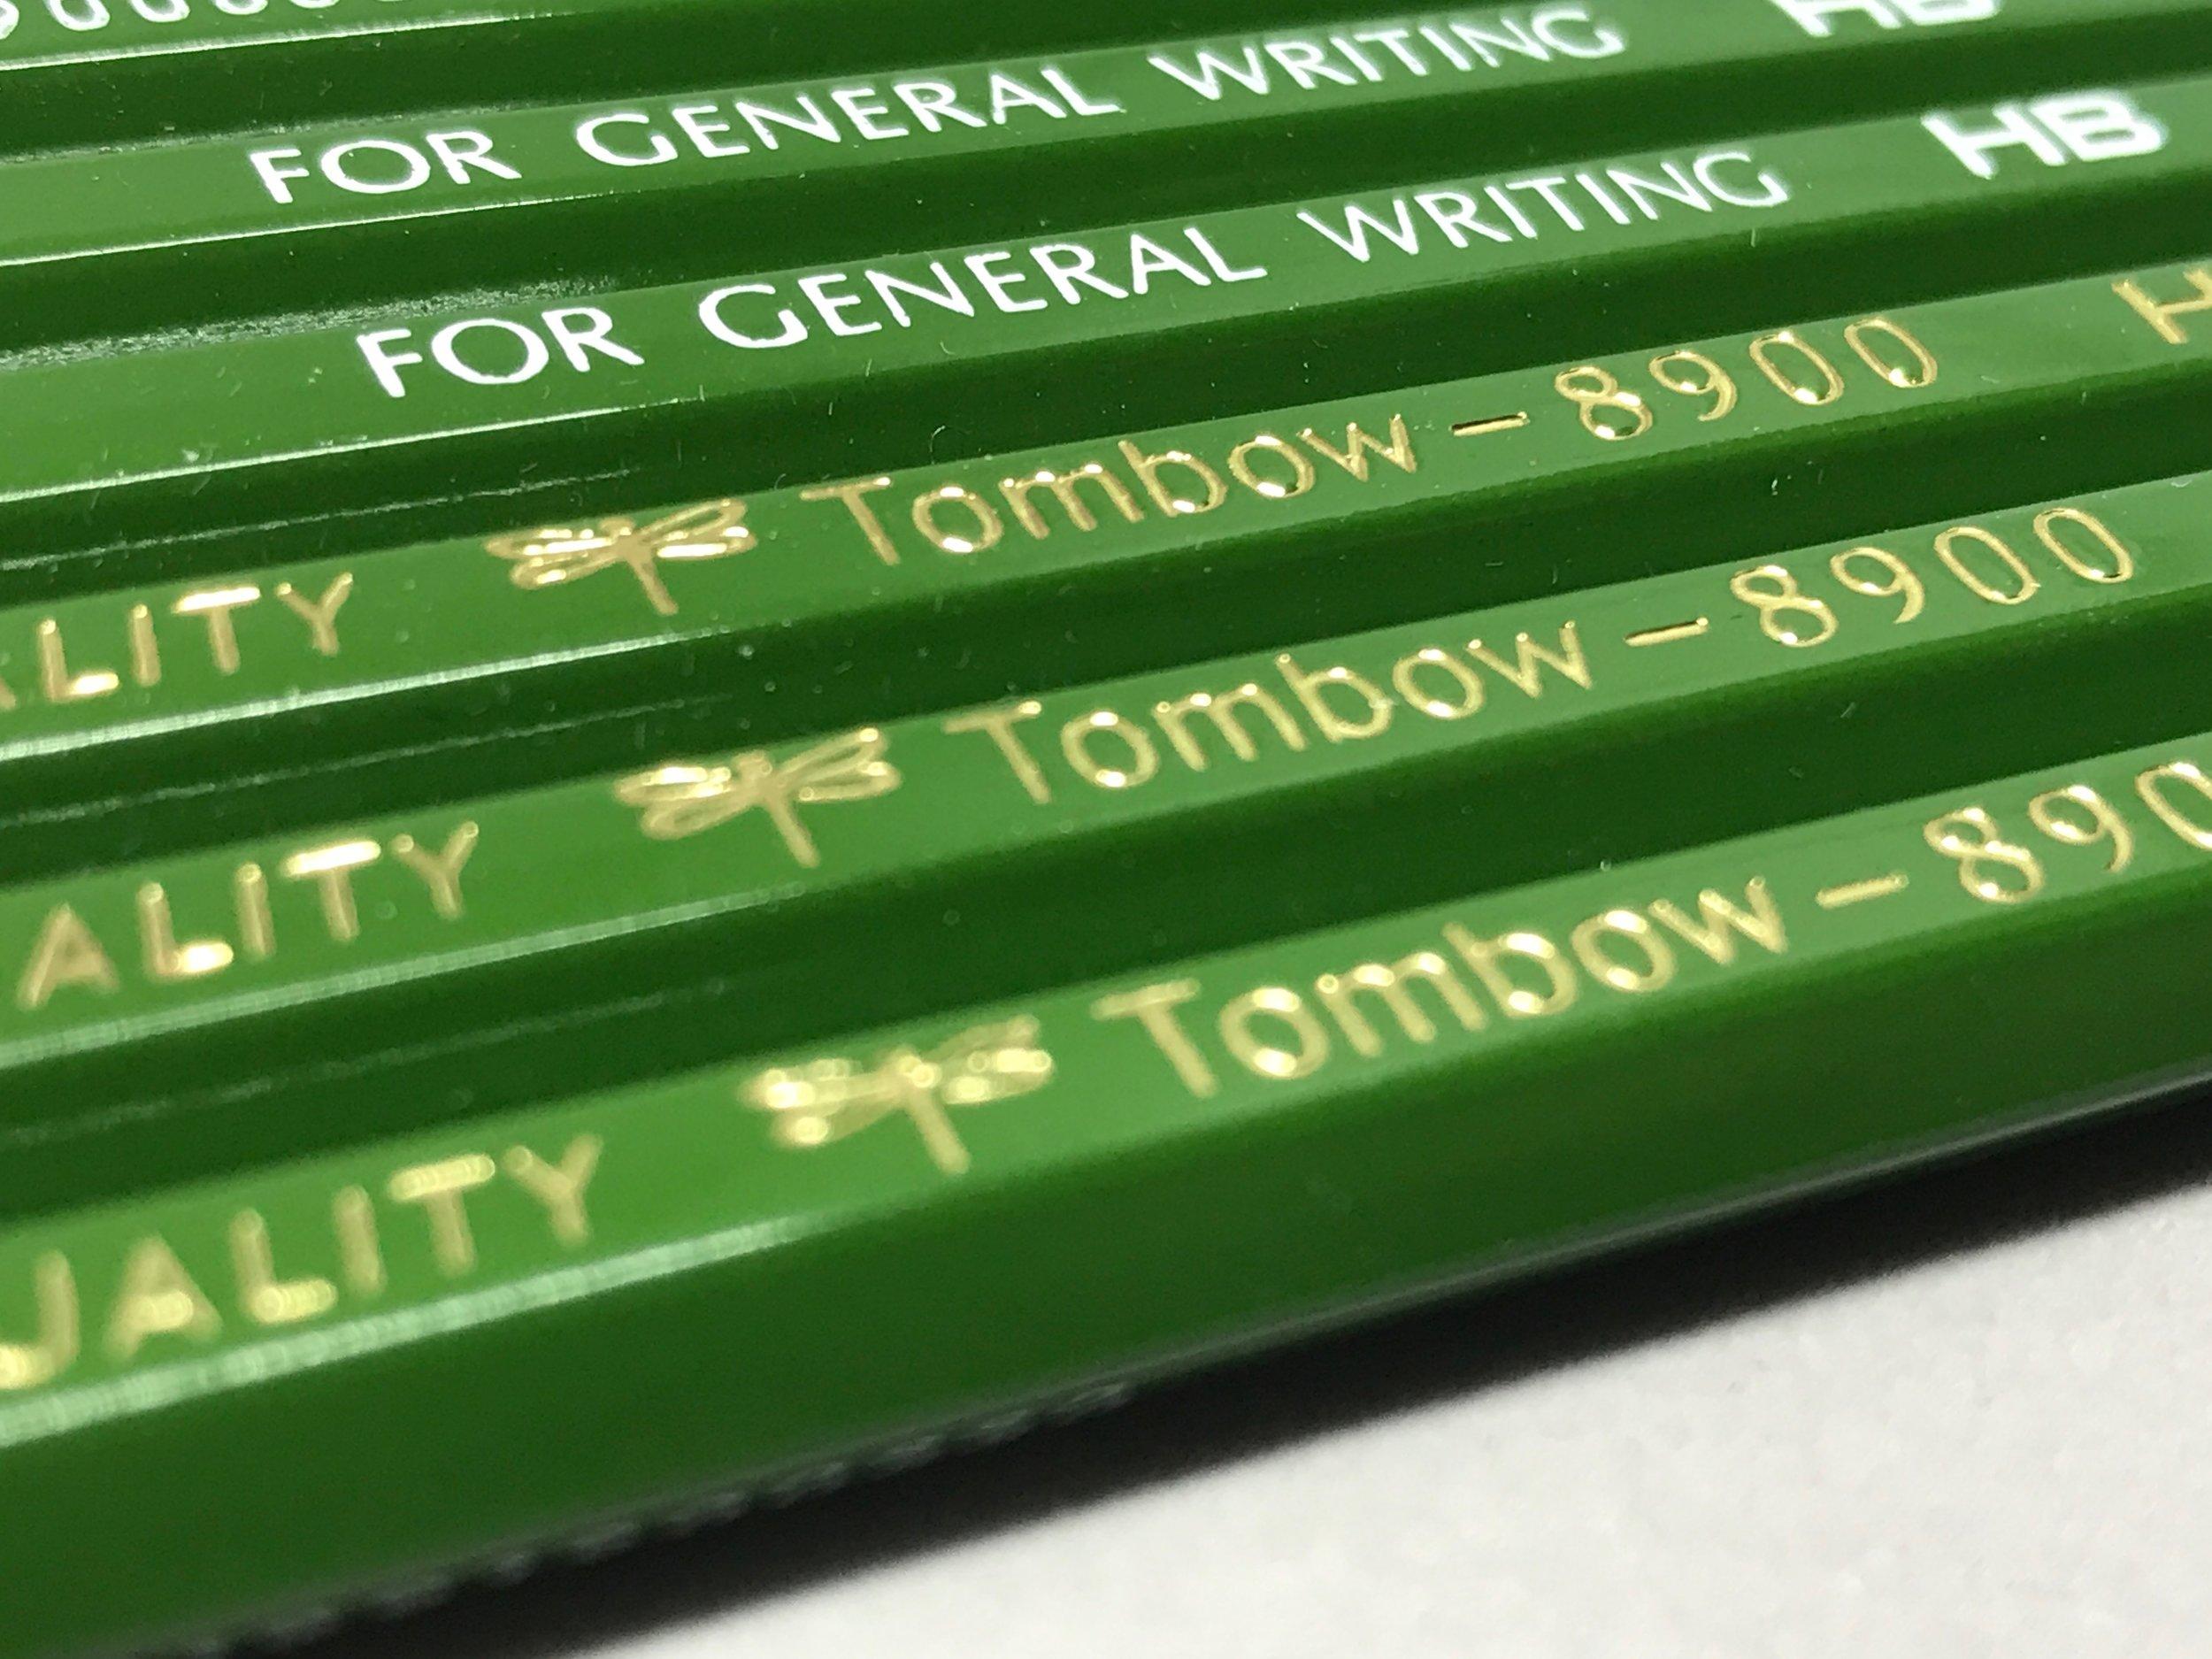 tombow-8900-pencil-6.jpg